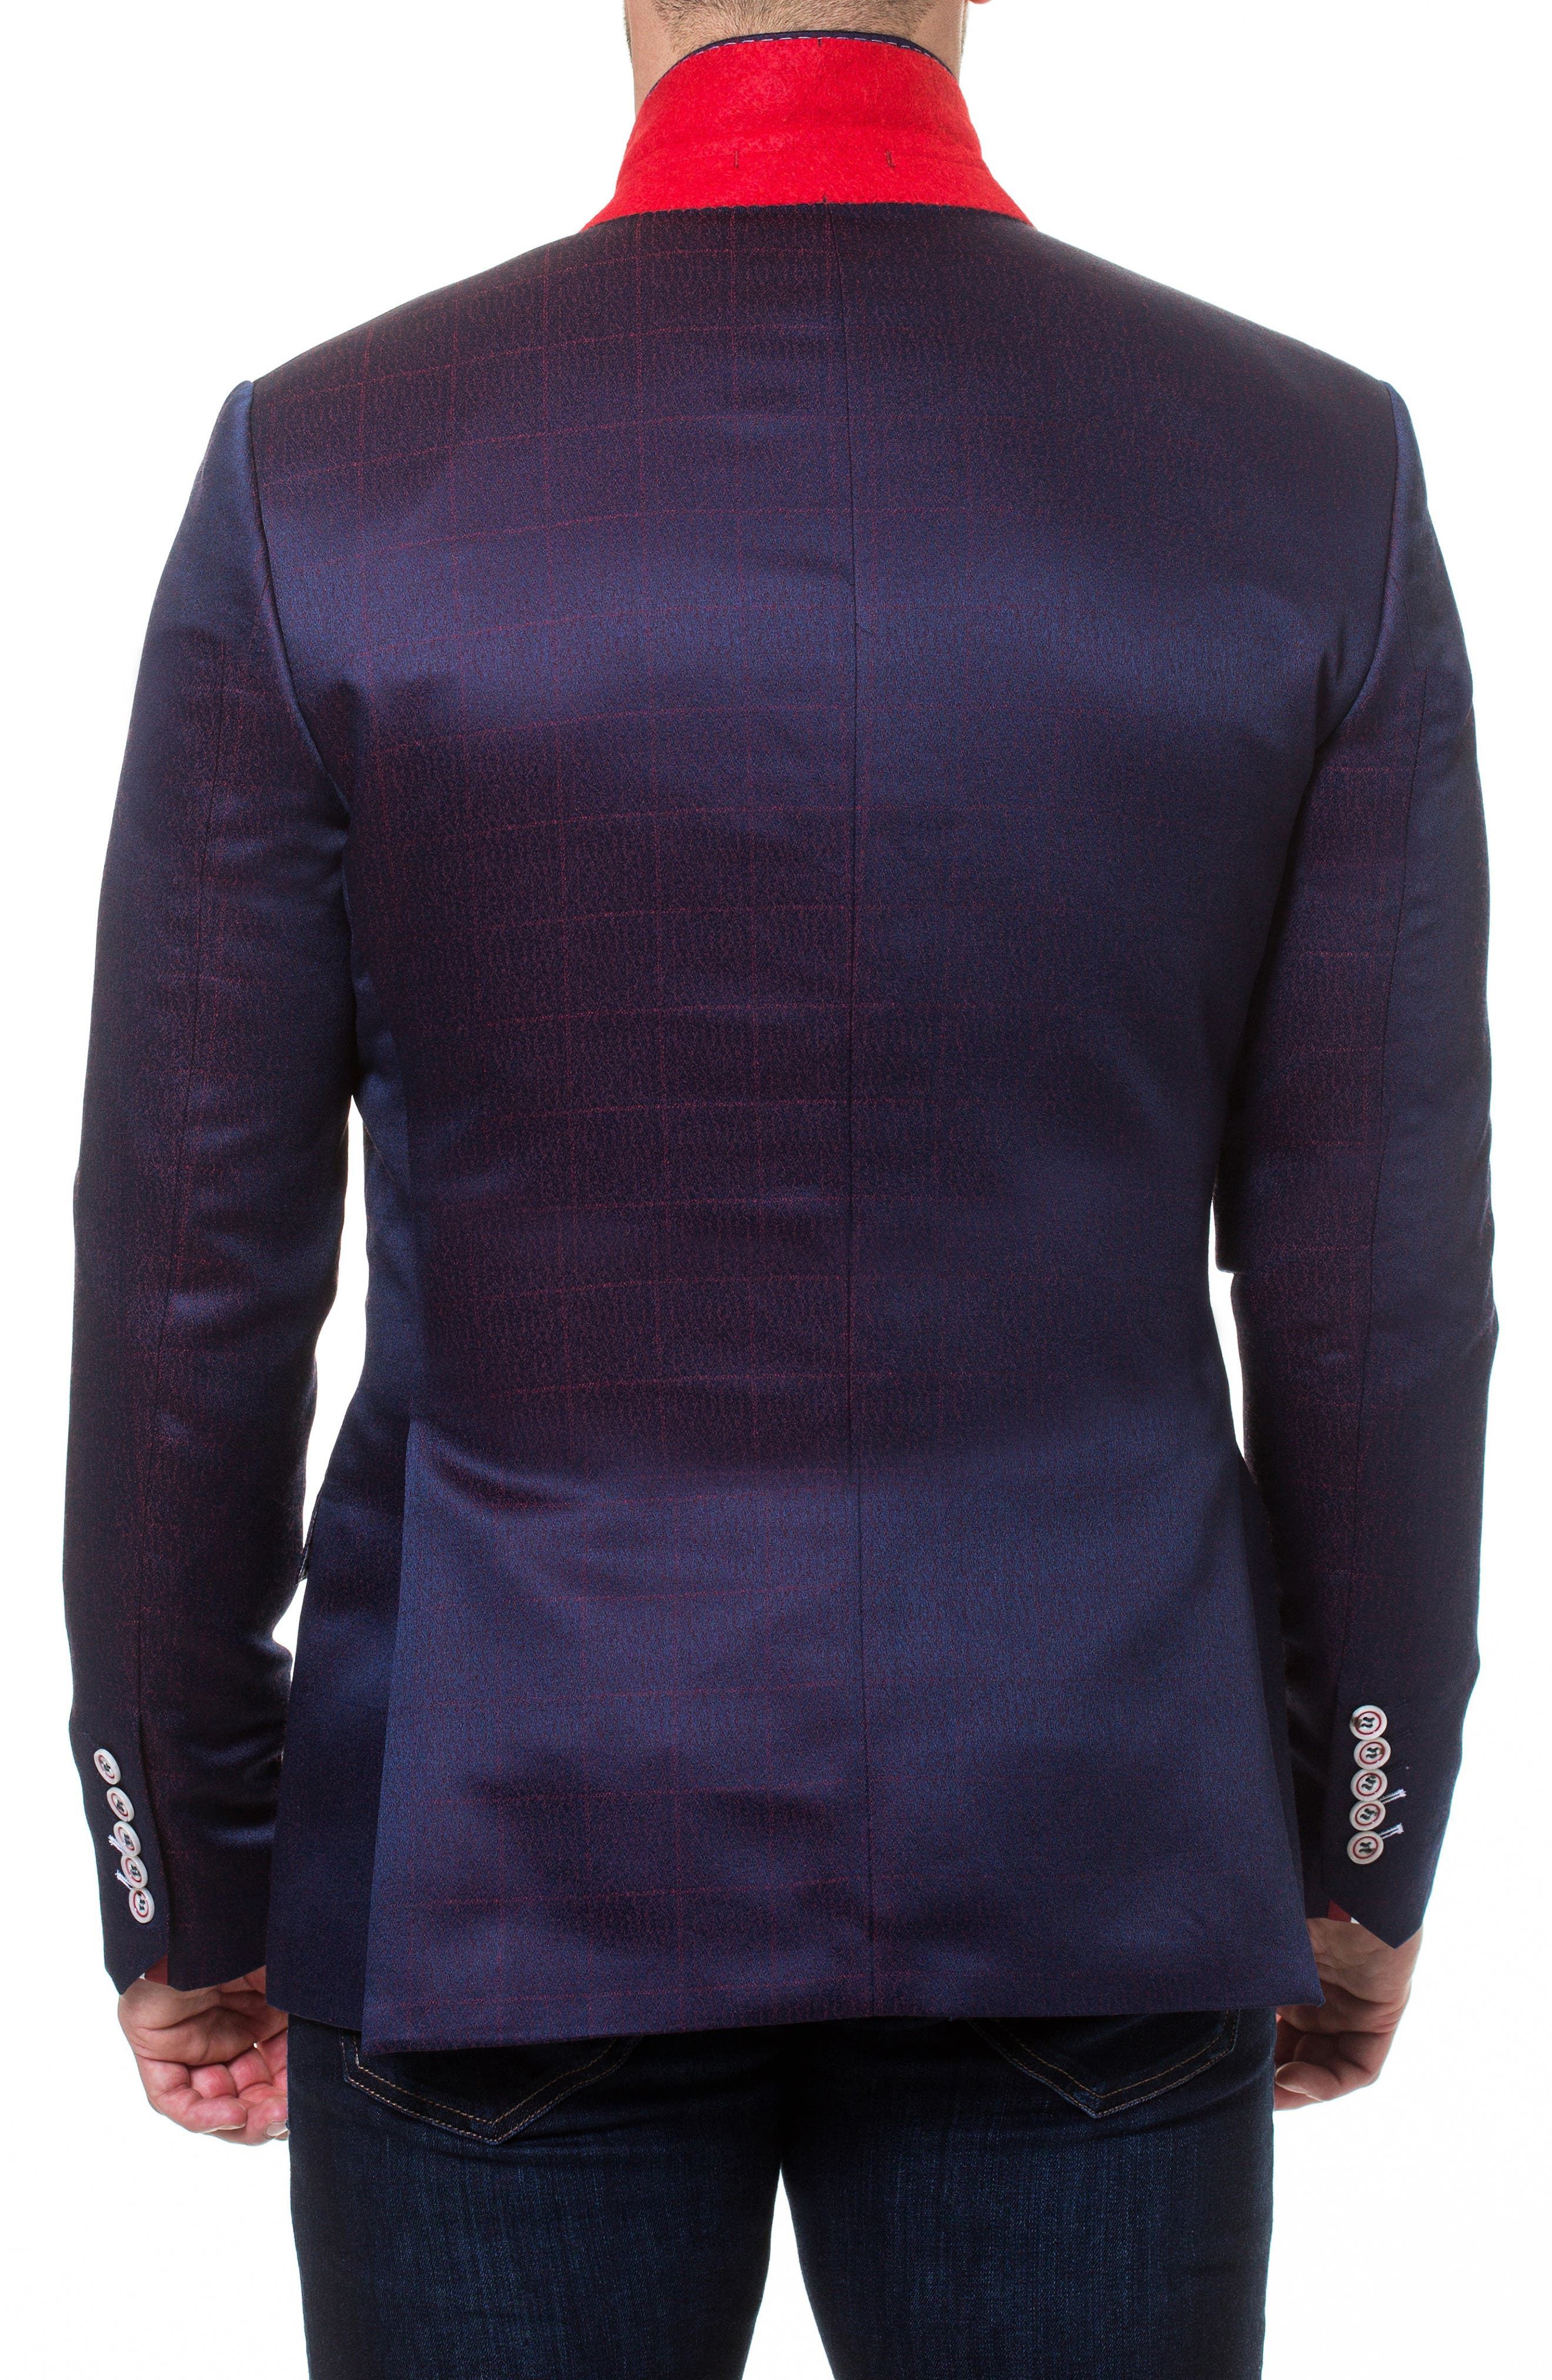 Socrate Fade Sport Coat,                             Alternate thumbnail 3, color,                             Purple